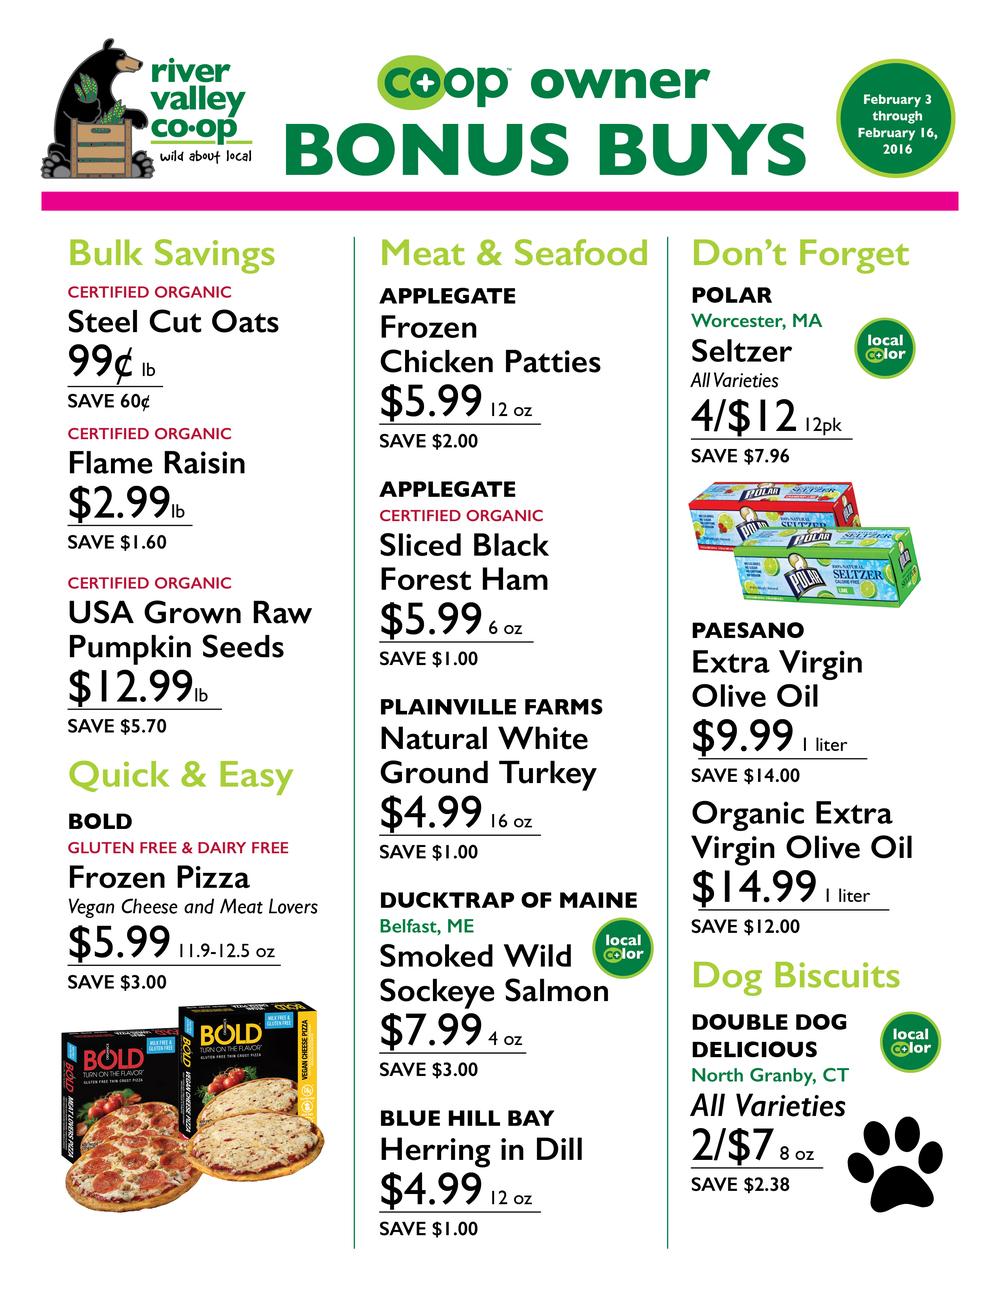 Co-op Owner Bonus Buys February 3 – 16, 2016